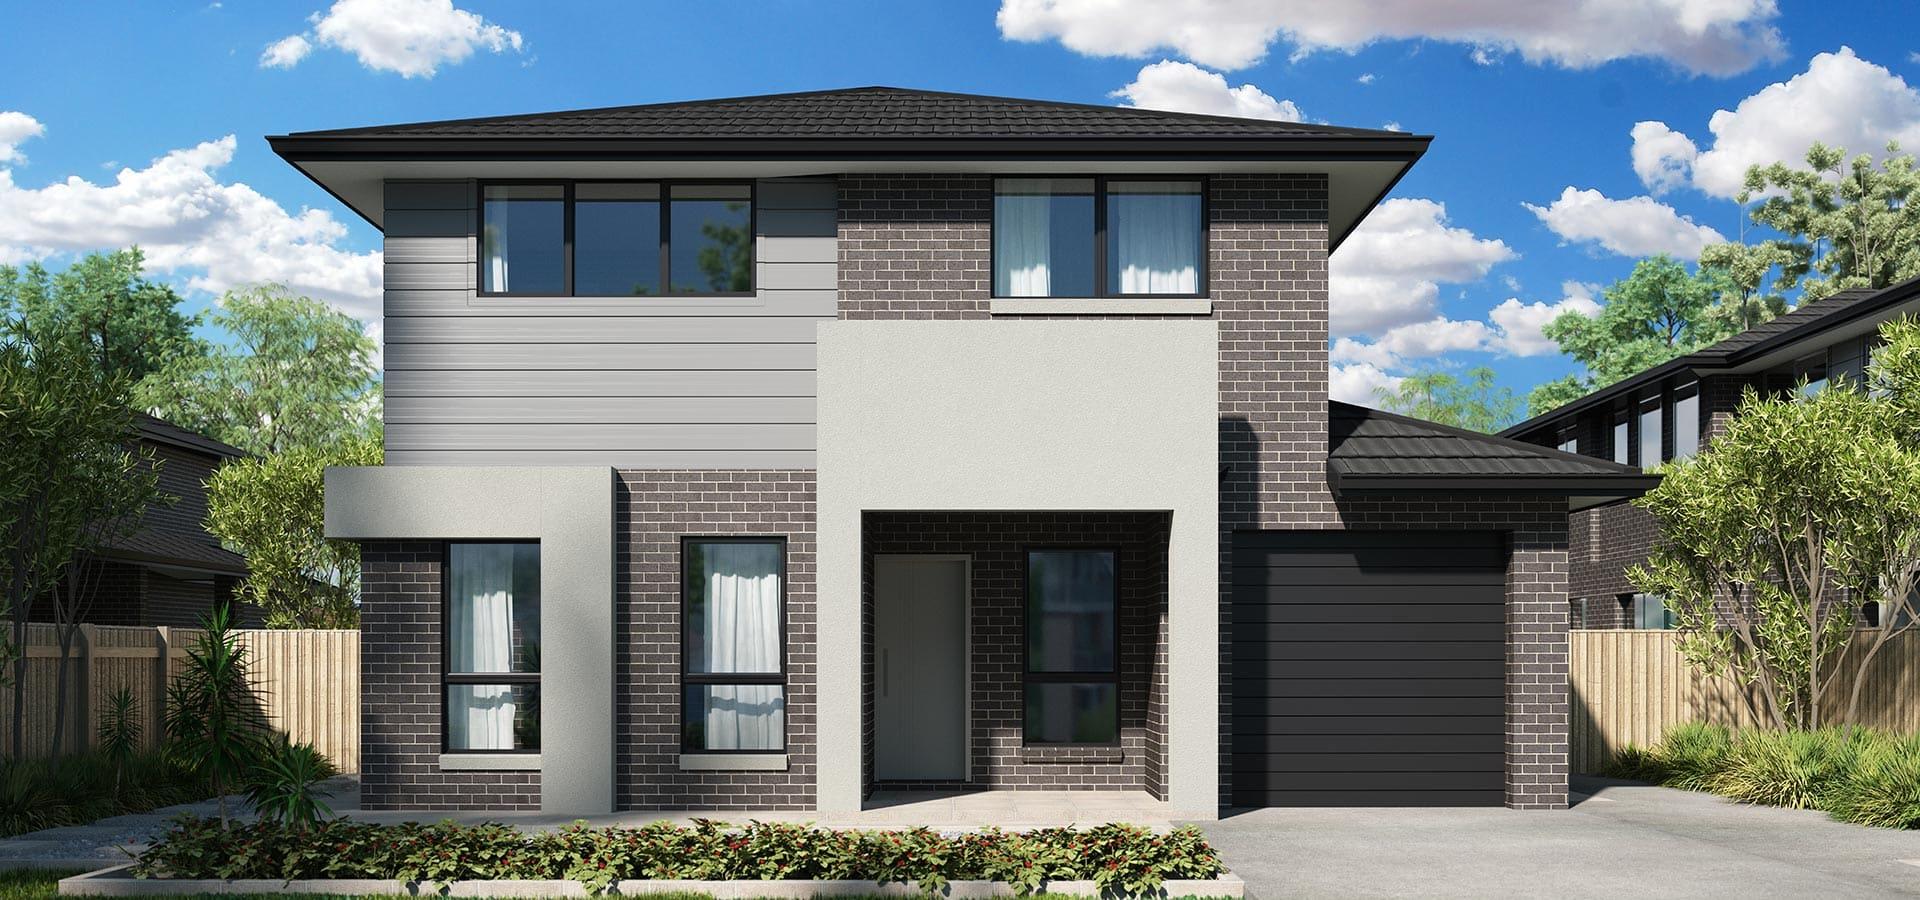 BLAZING-STAR-Duplex-House-Designs